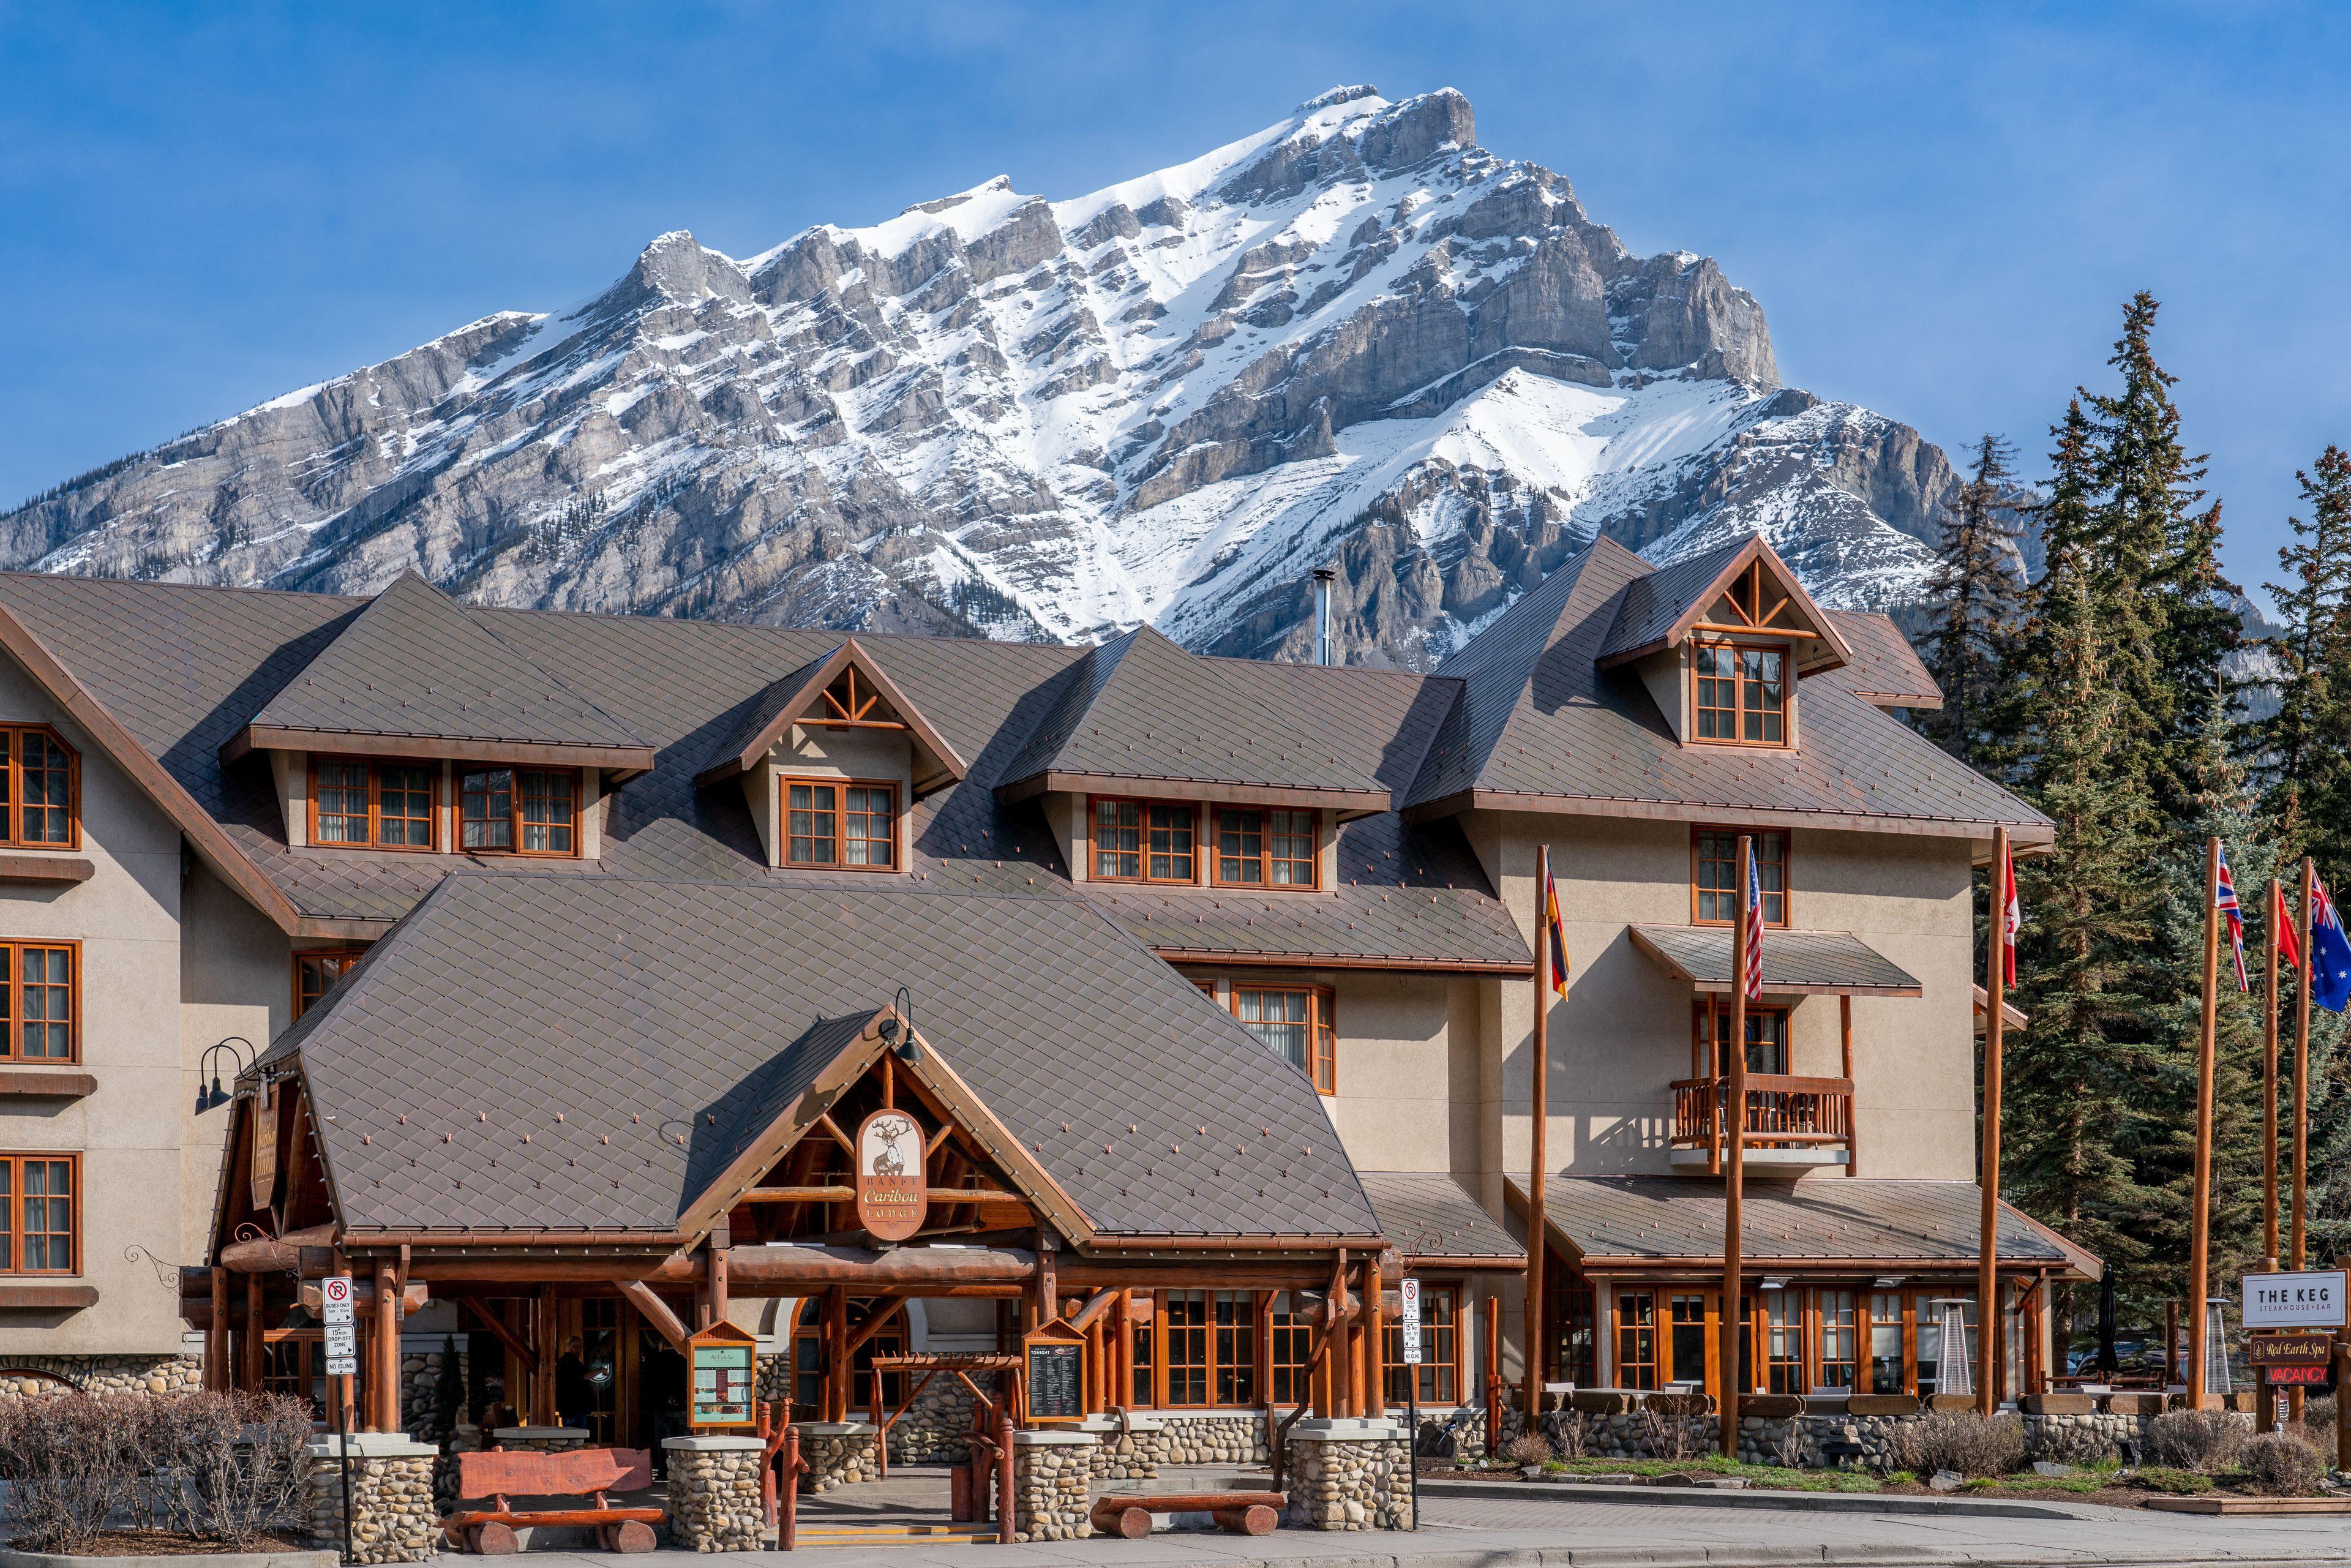 Courtesy of Banff Caribou Lodge and Spa / Expedia